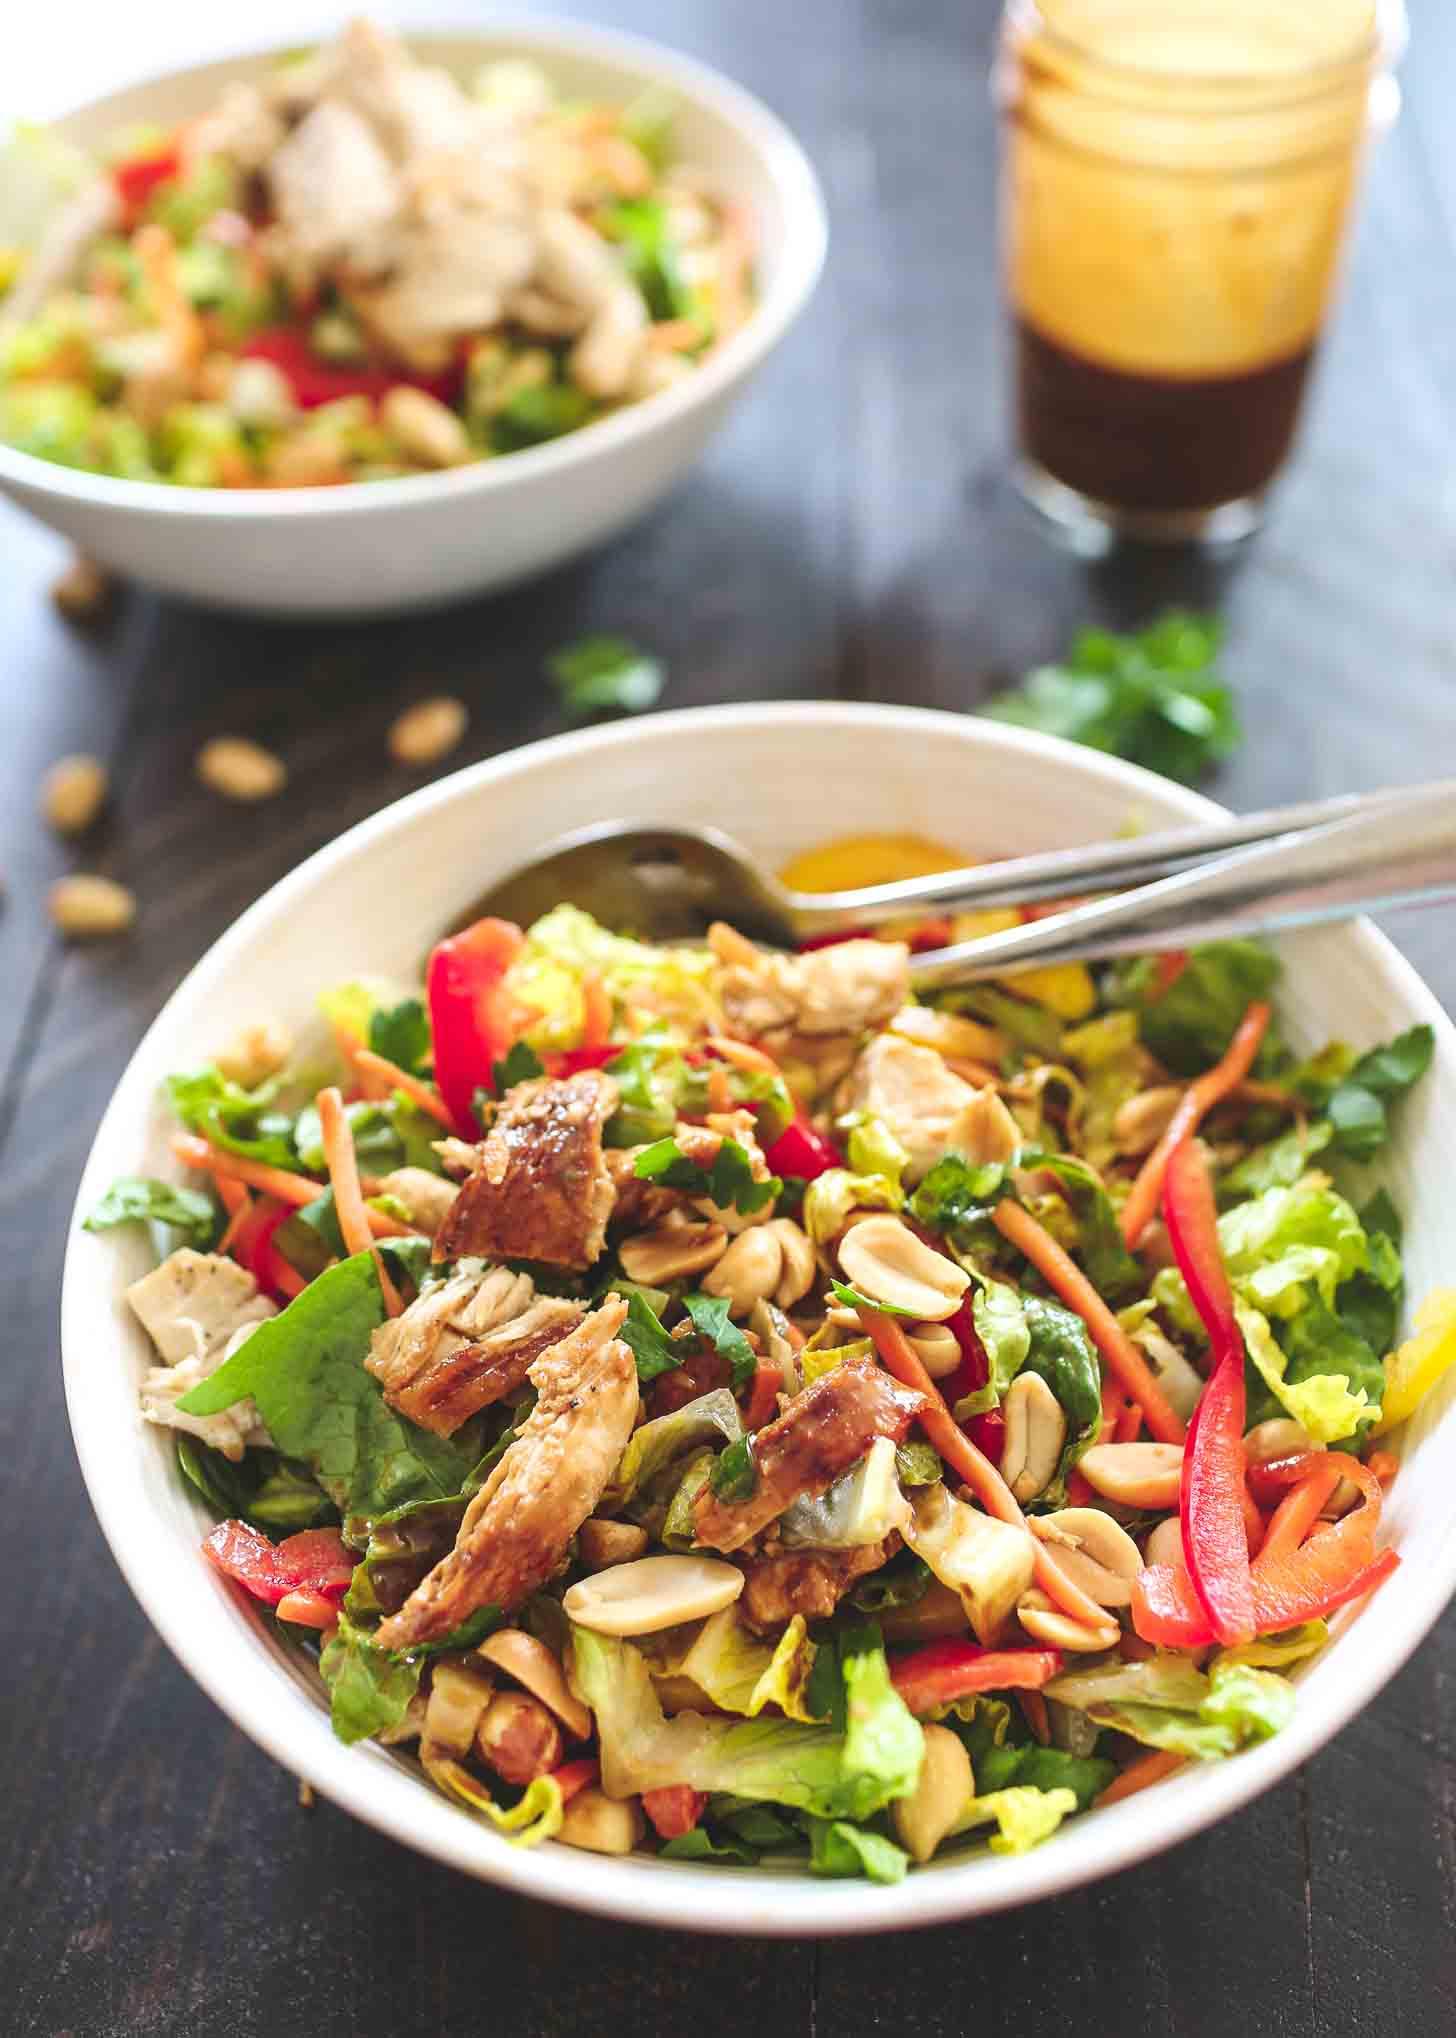 Chicken Salad in a white bowl